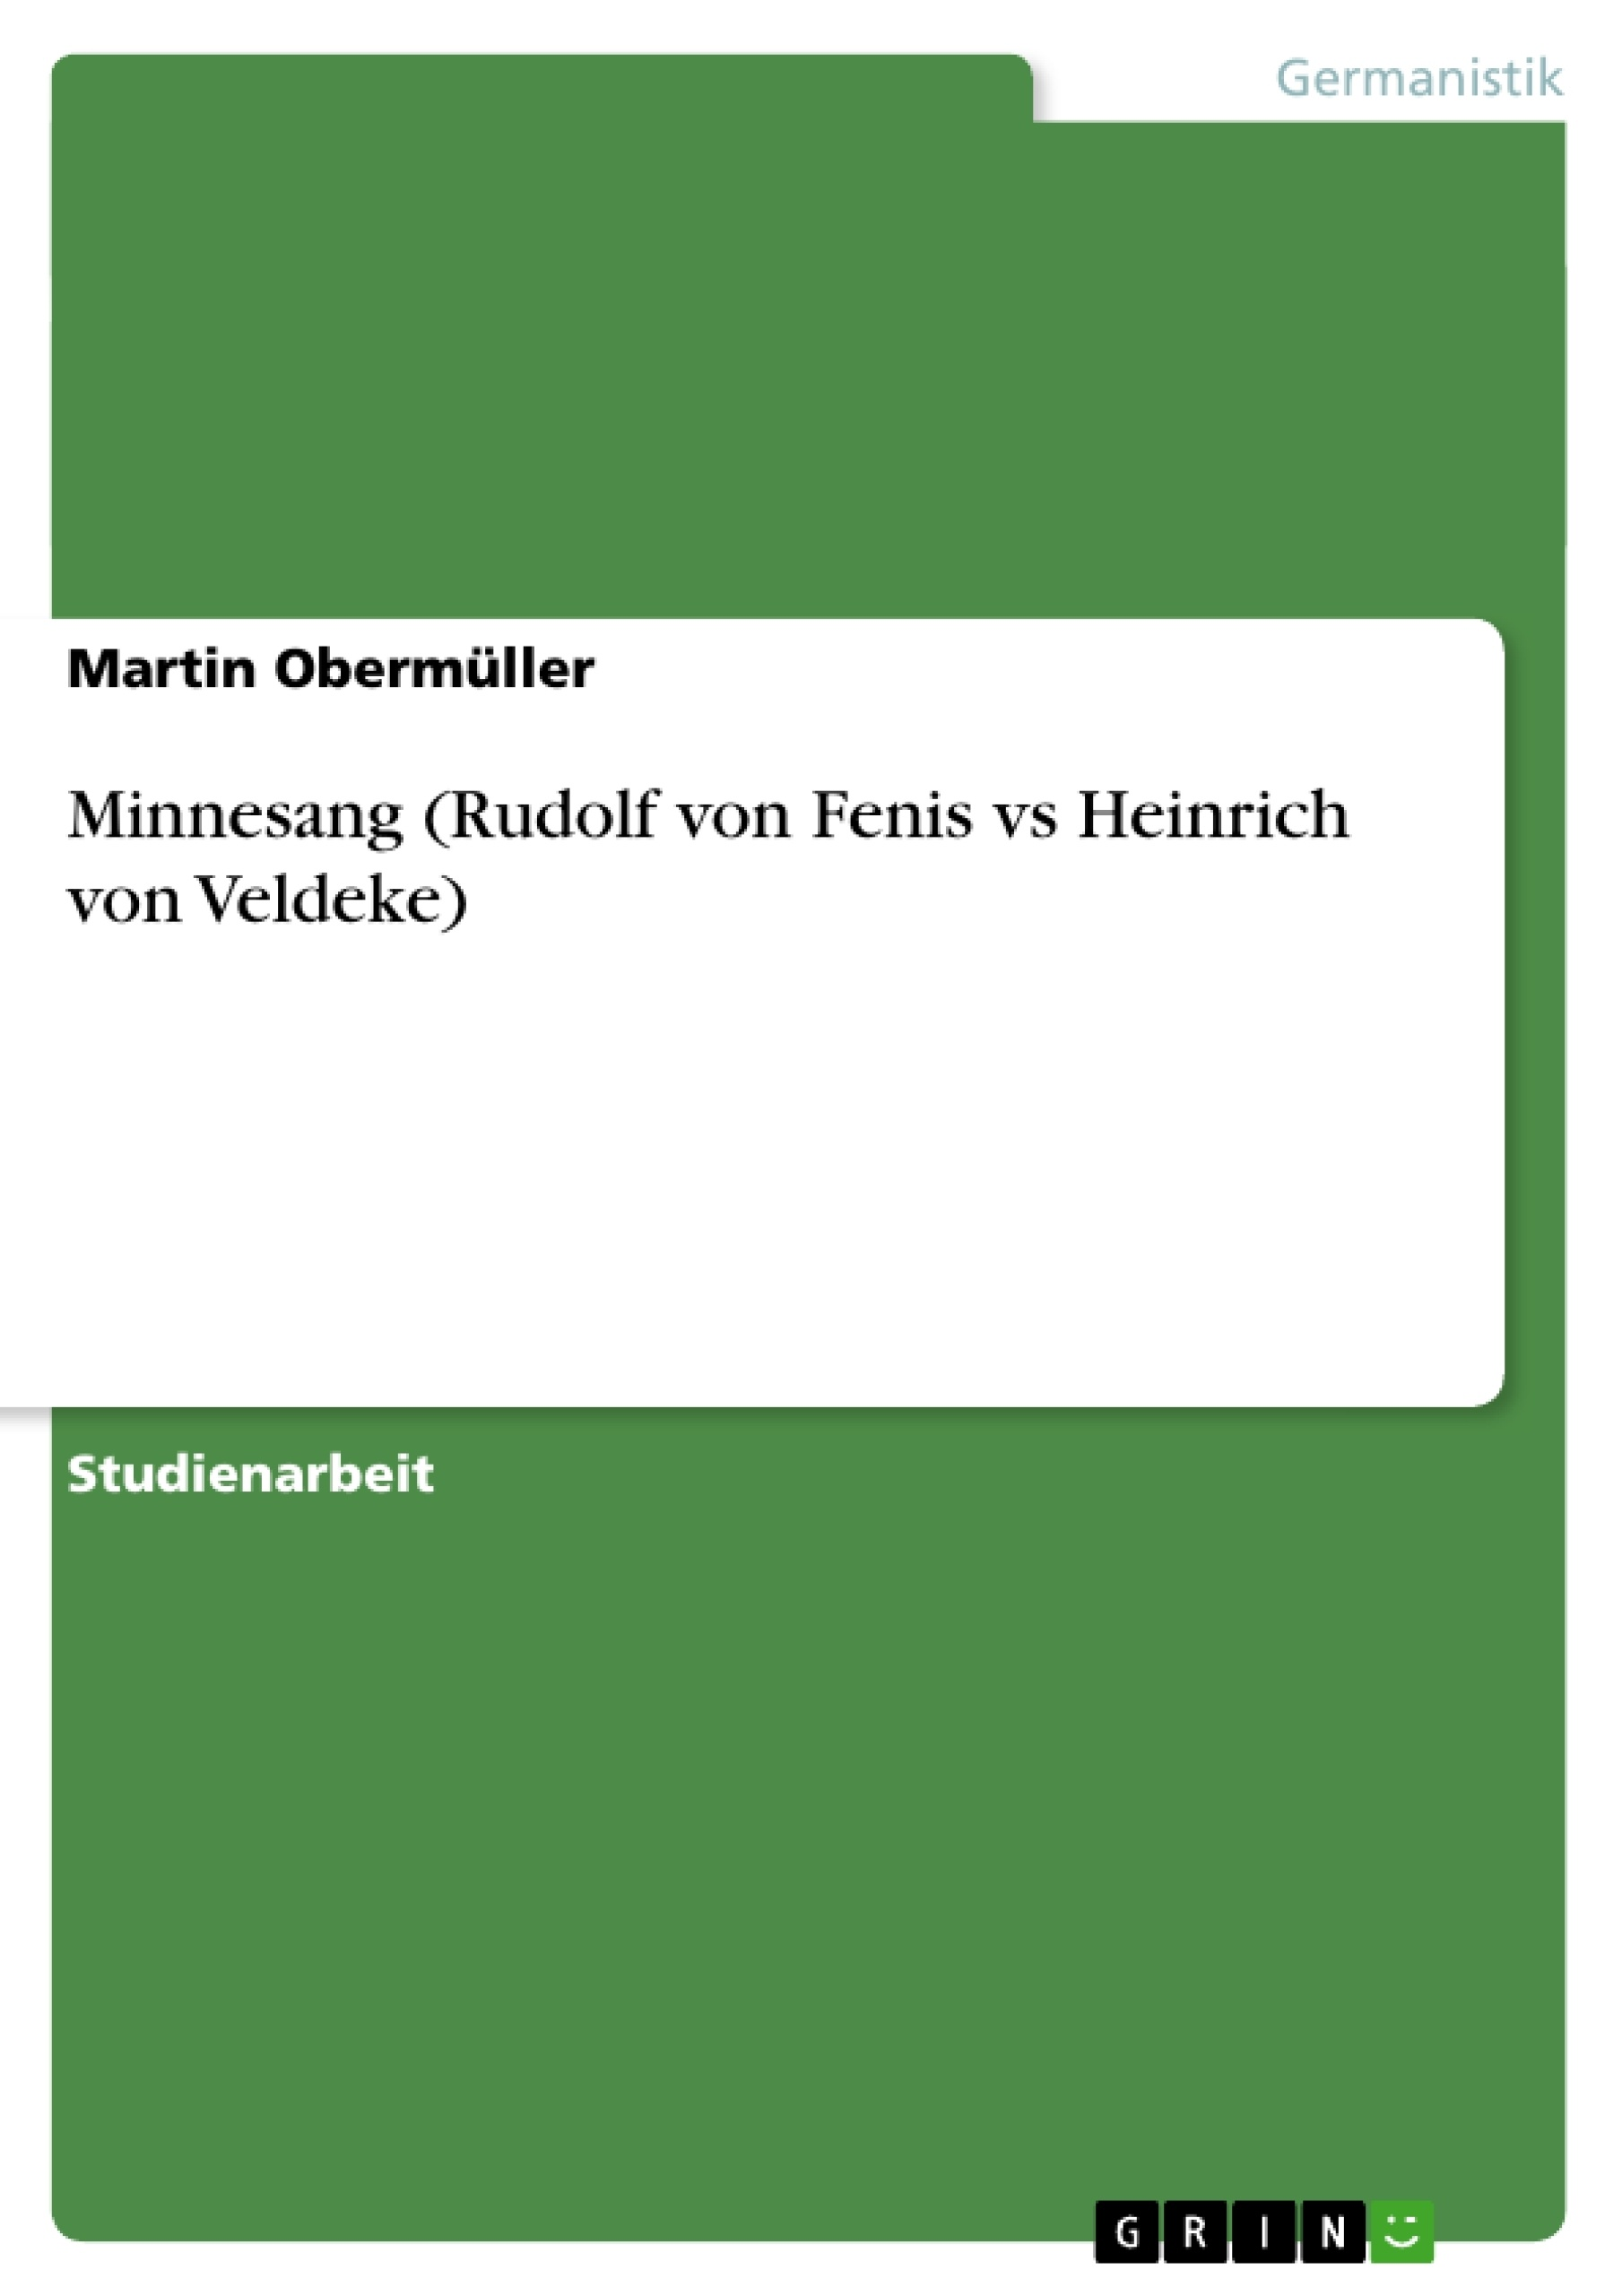 Titel: Minnesang (Rudolf von Fenis vs Heinrich von Veldeke)